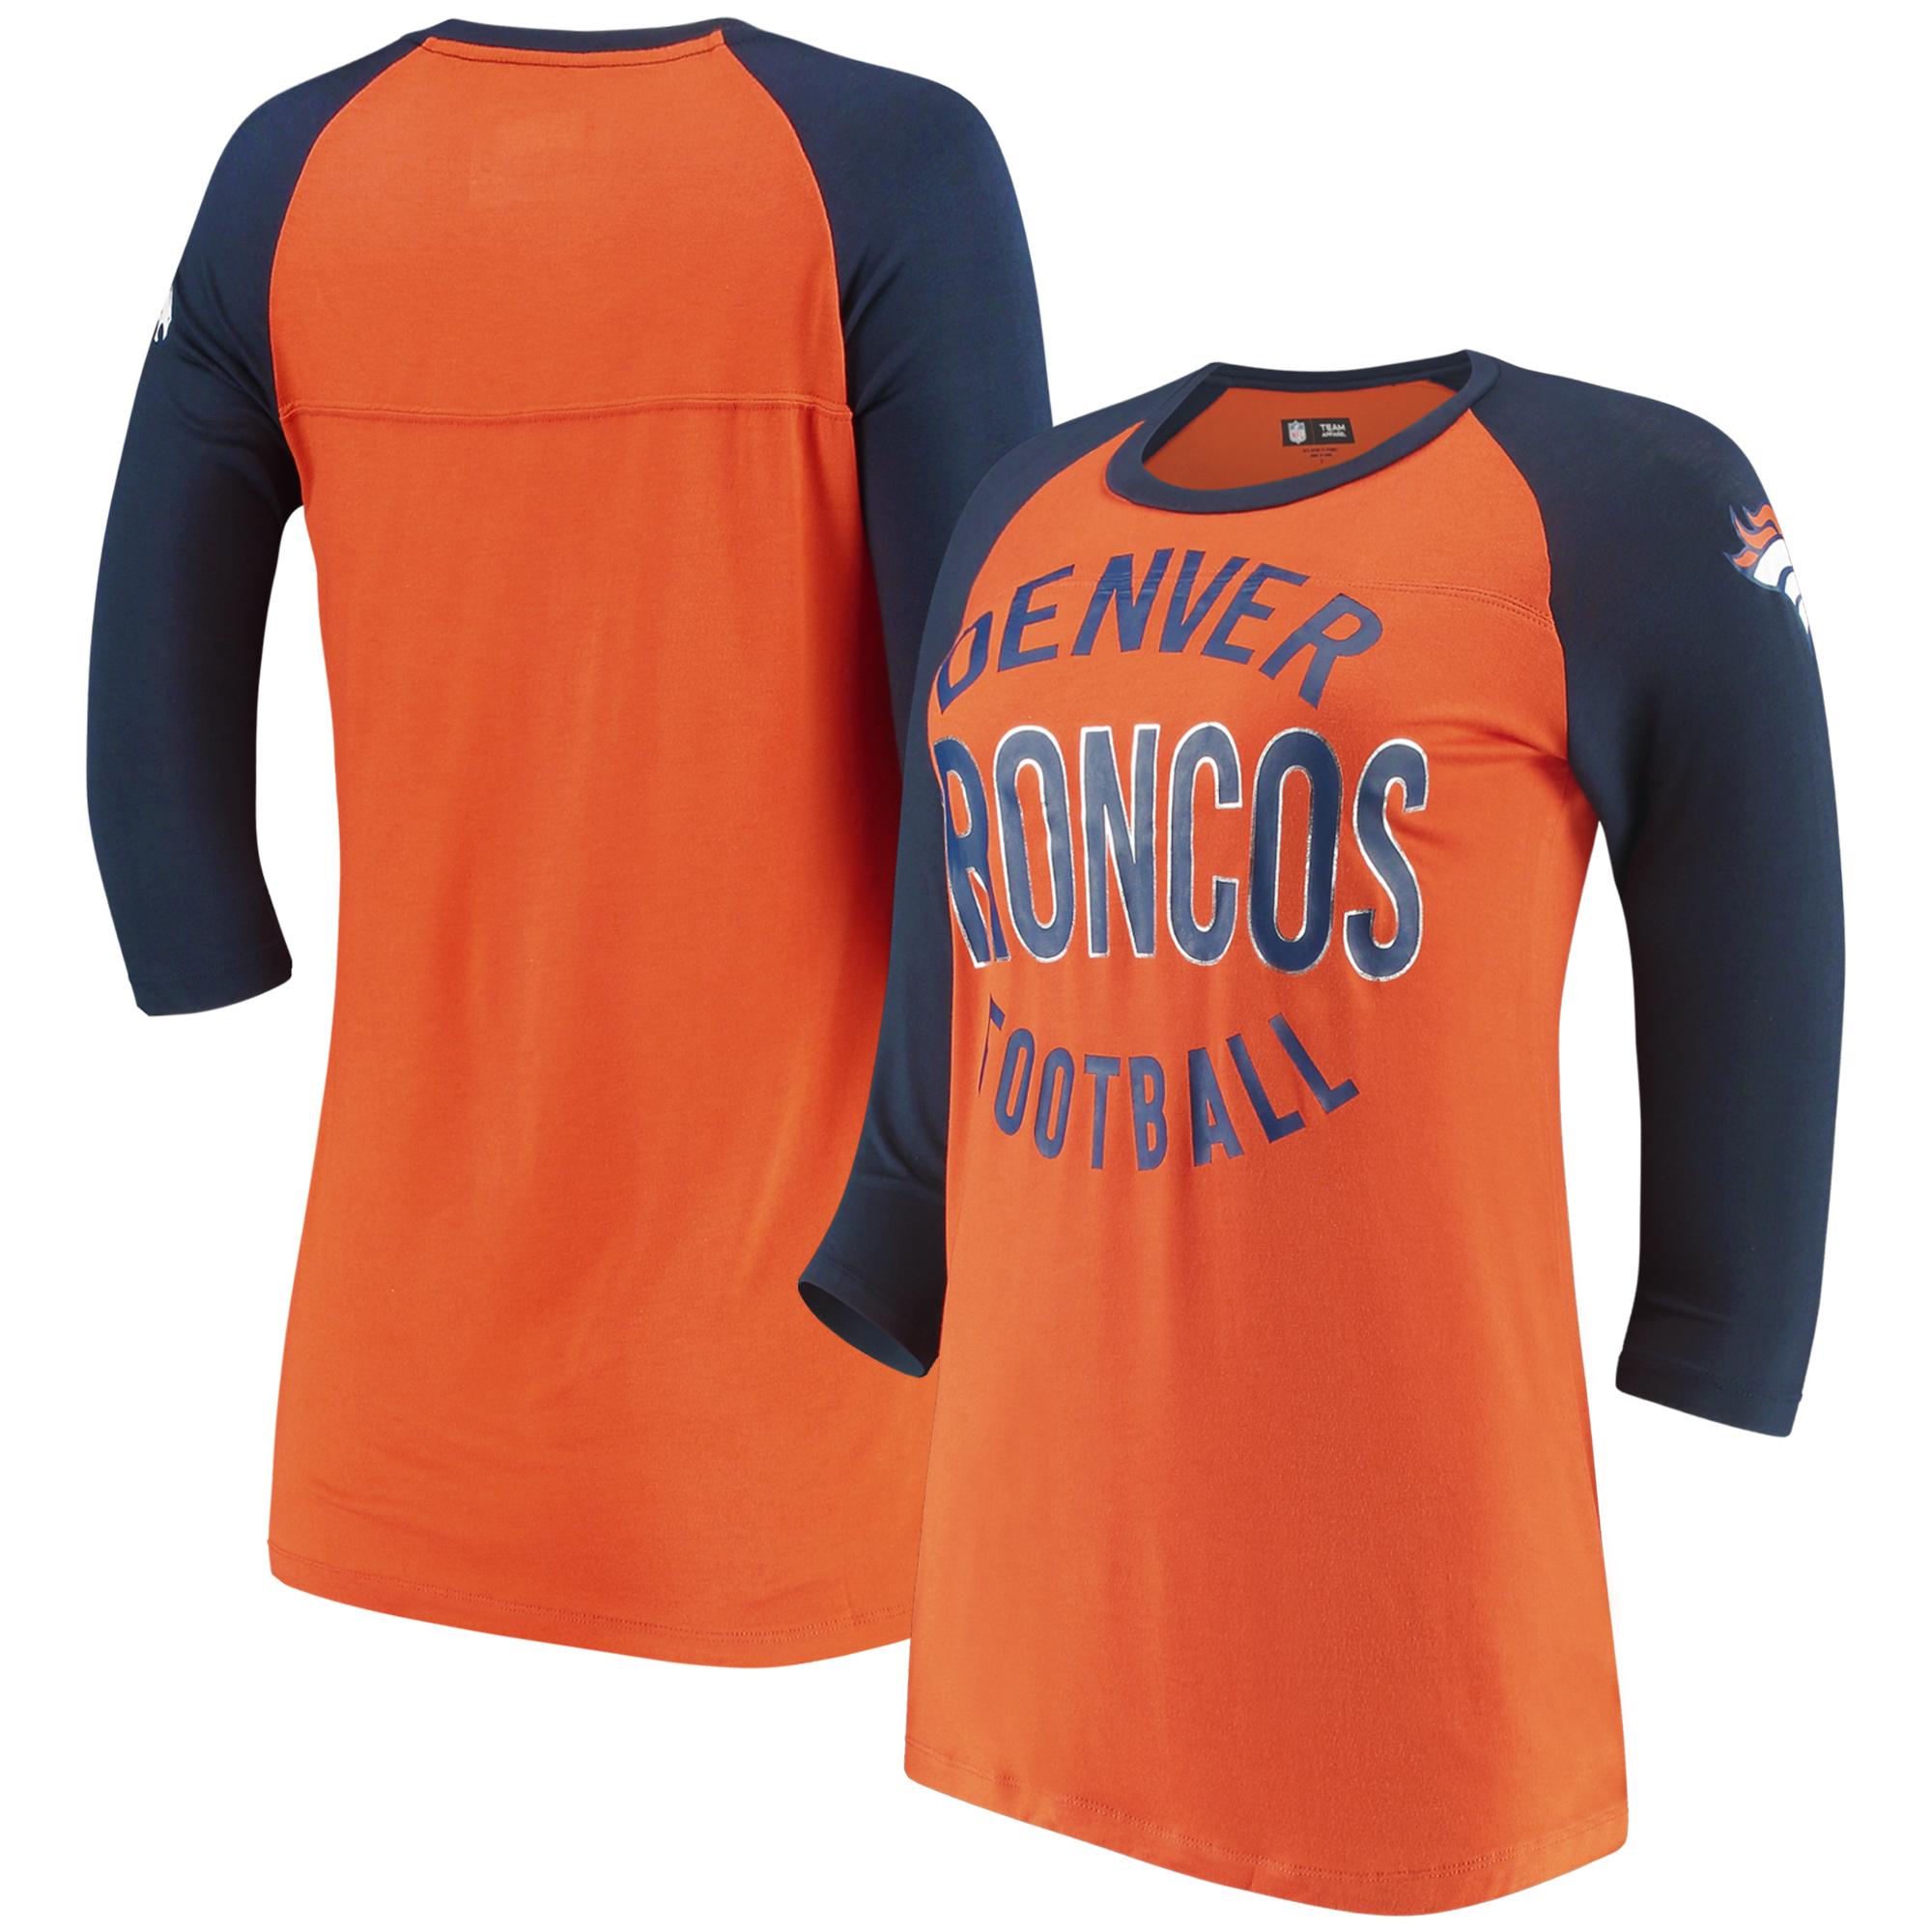 Denver Broncos 5th & Ocean by New Era Women's Novelty 3/4-Sleeve Scoop Neck T-Shirt - Orange/Navy